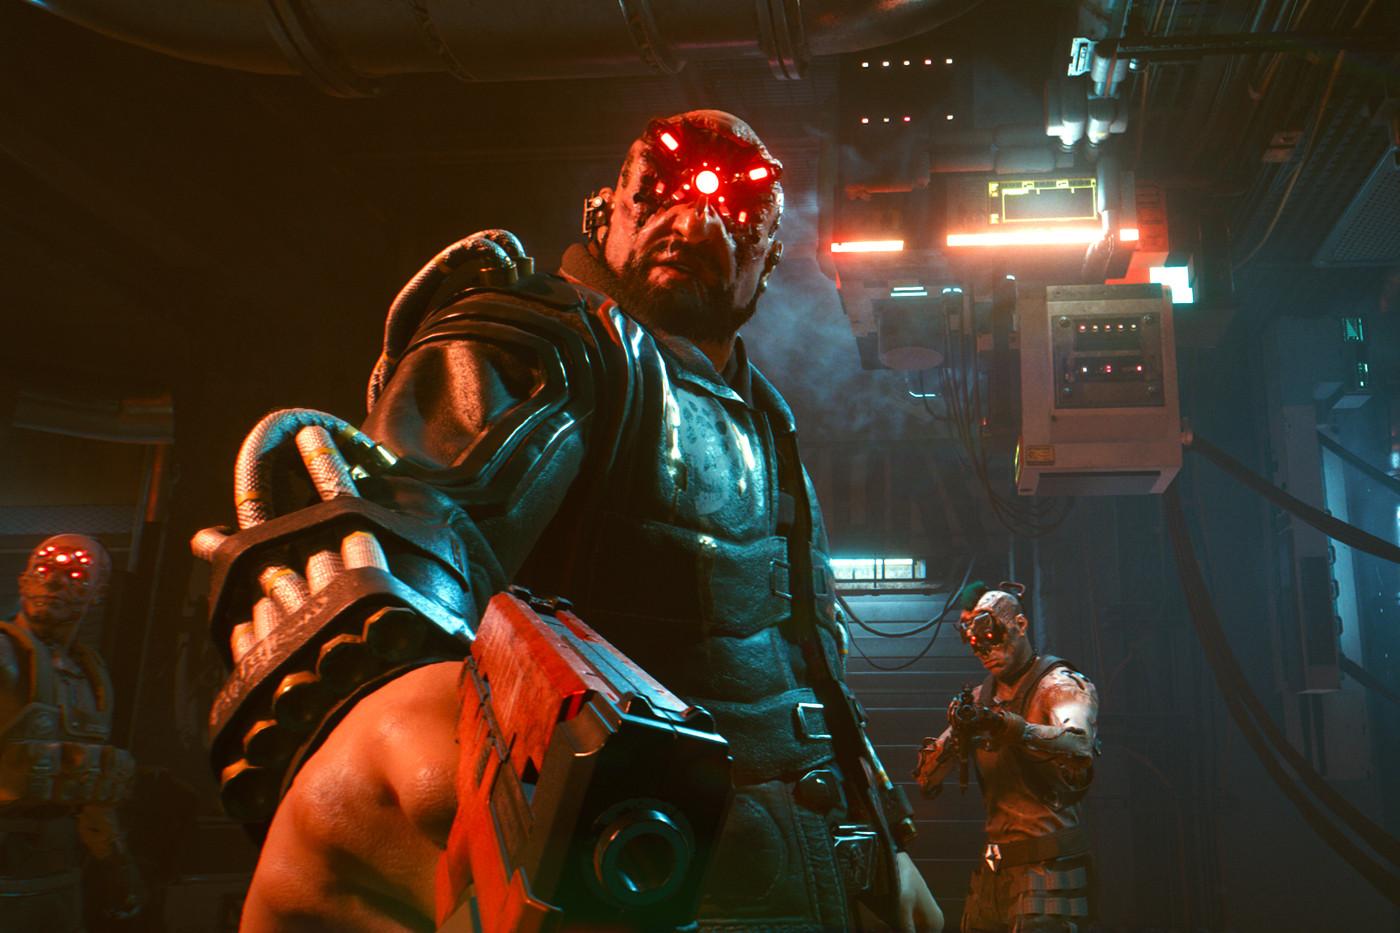 Gaben Newell ผู้ก่อตั้ง Valve เชื่อว่า CD Projekt Red จะกู้ชื่อเสียงกลับมาได้!